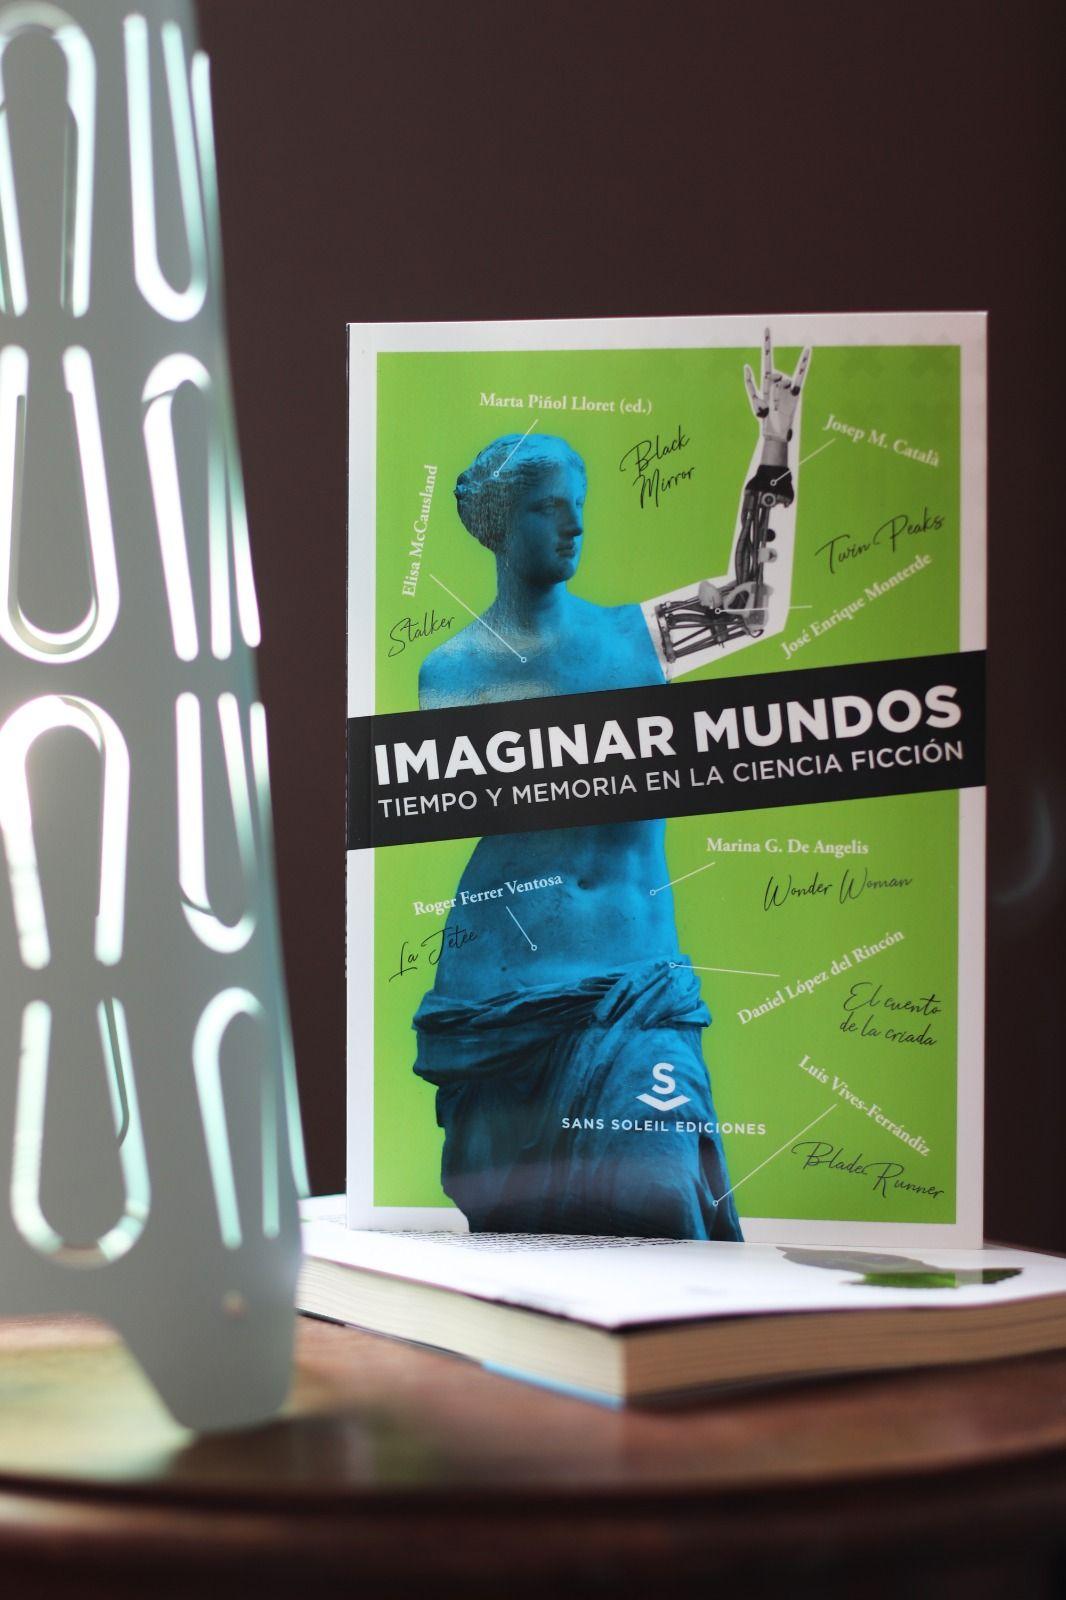 Imaginar Mundos – Sans Soleil Ediciones 2019-05-14 at 19.45.44 (1)